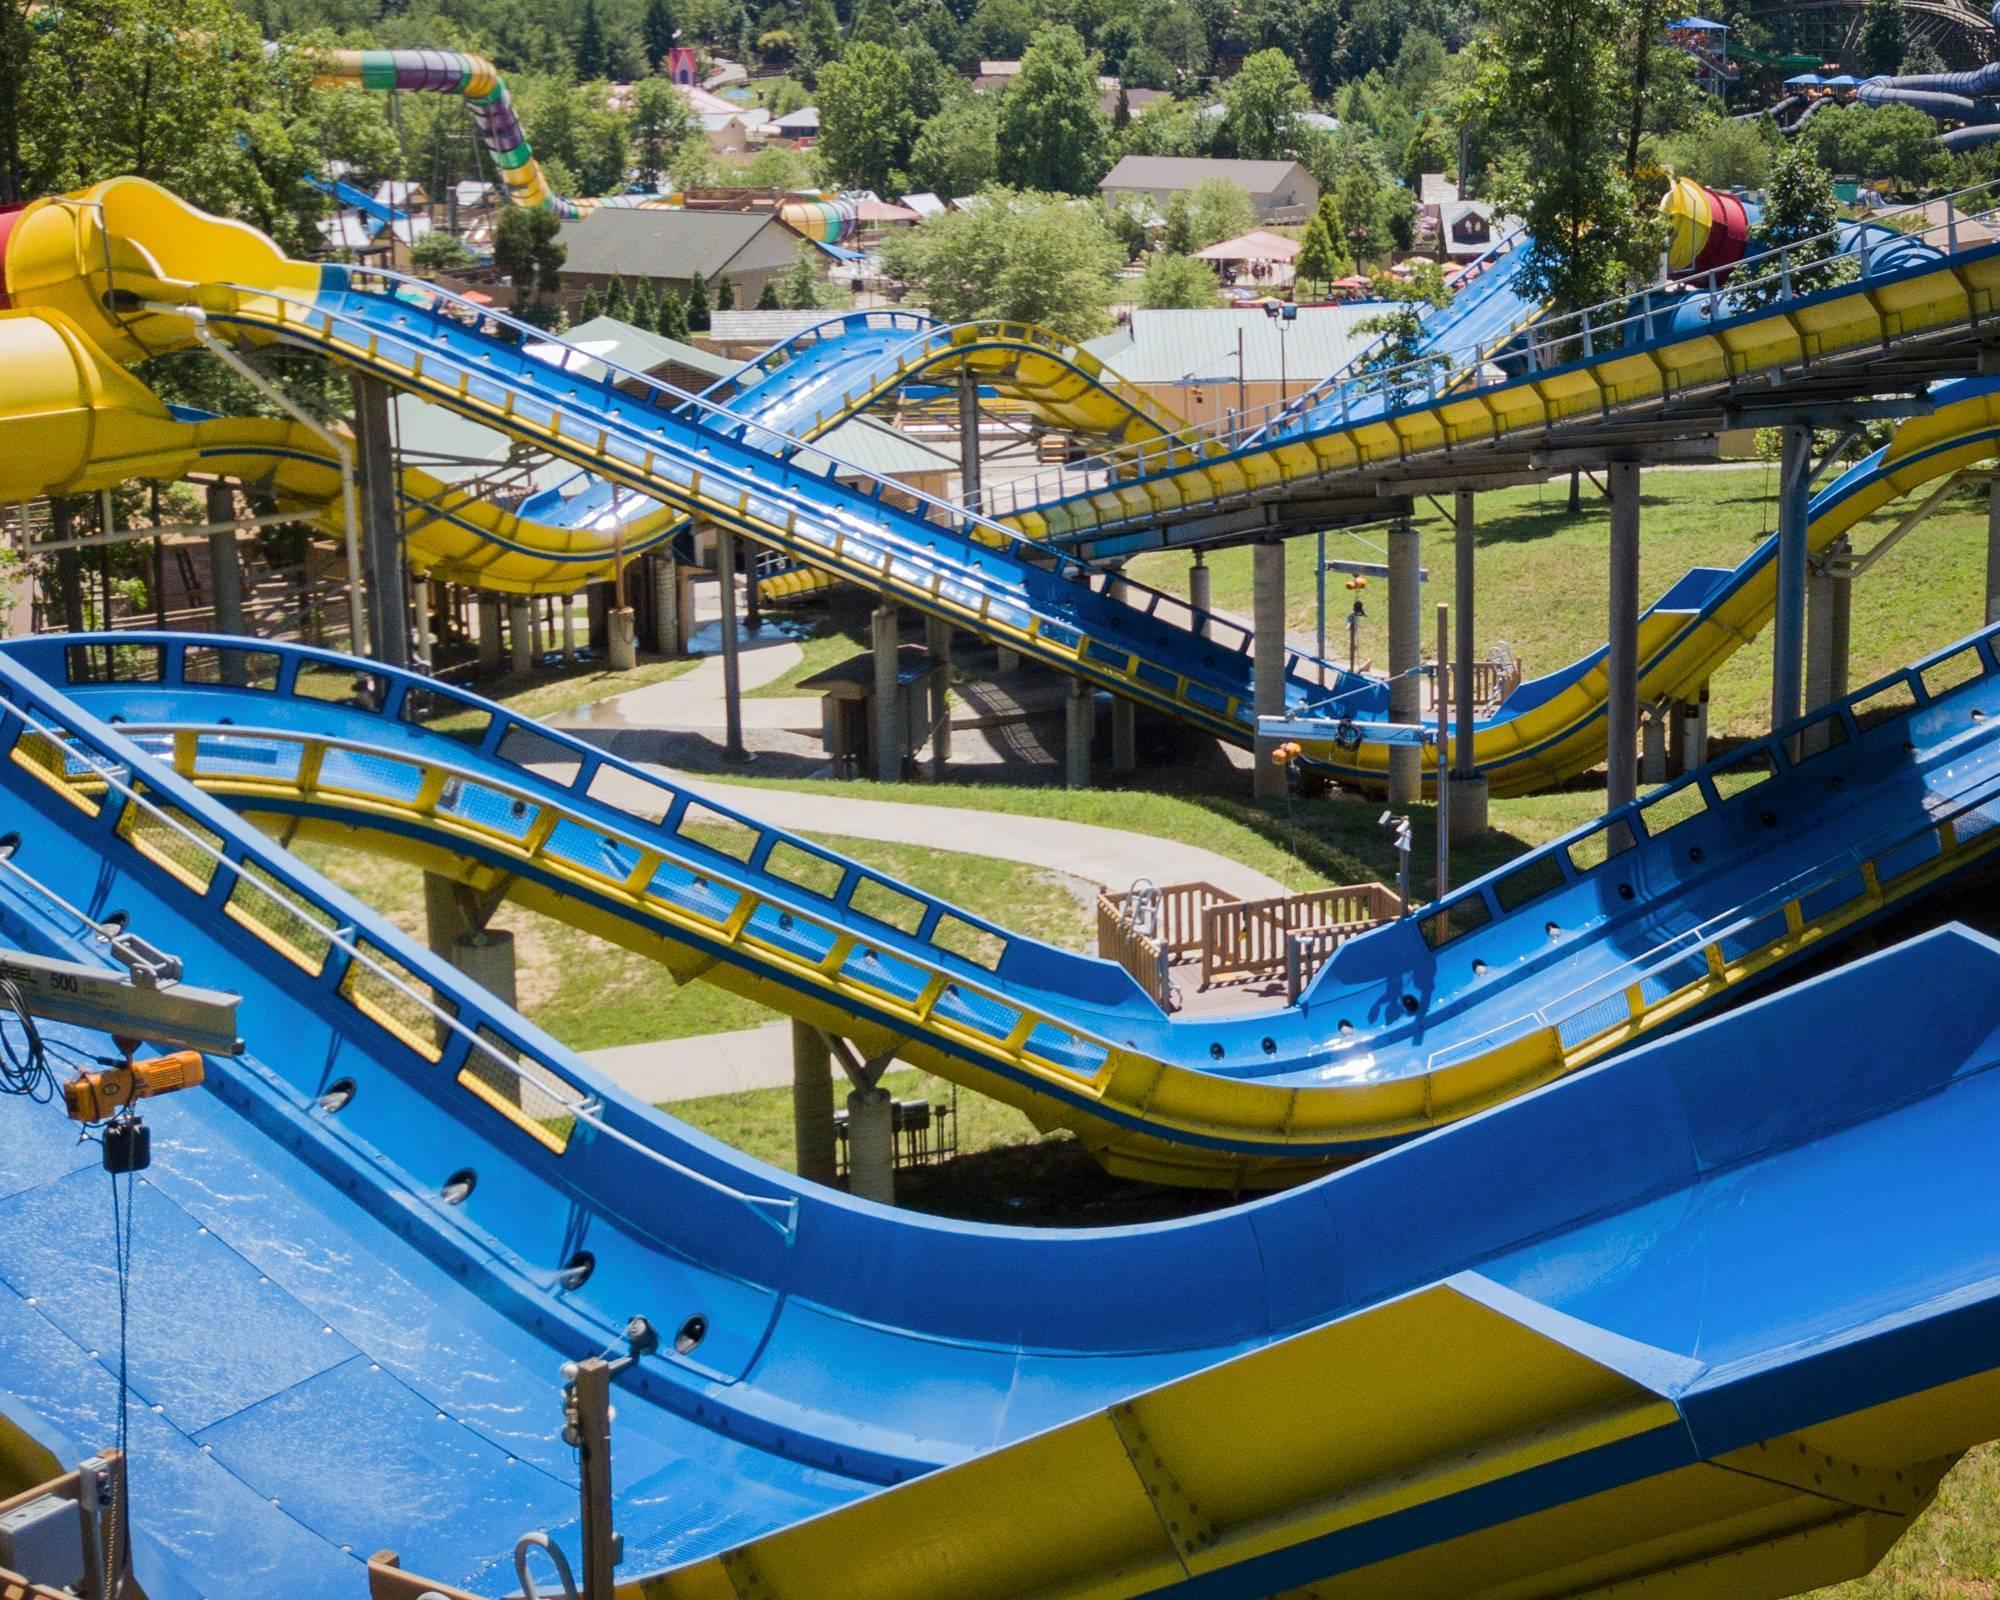 Mammoth - World's Longest Water Coaster | Holiday World & Splashin' Safari